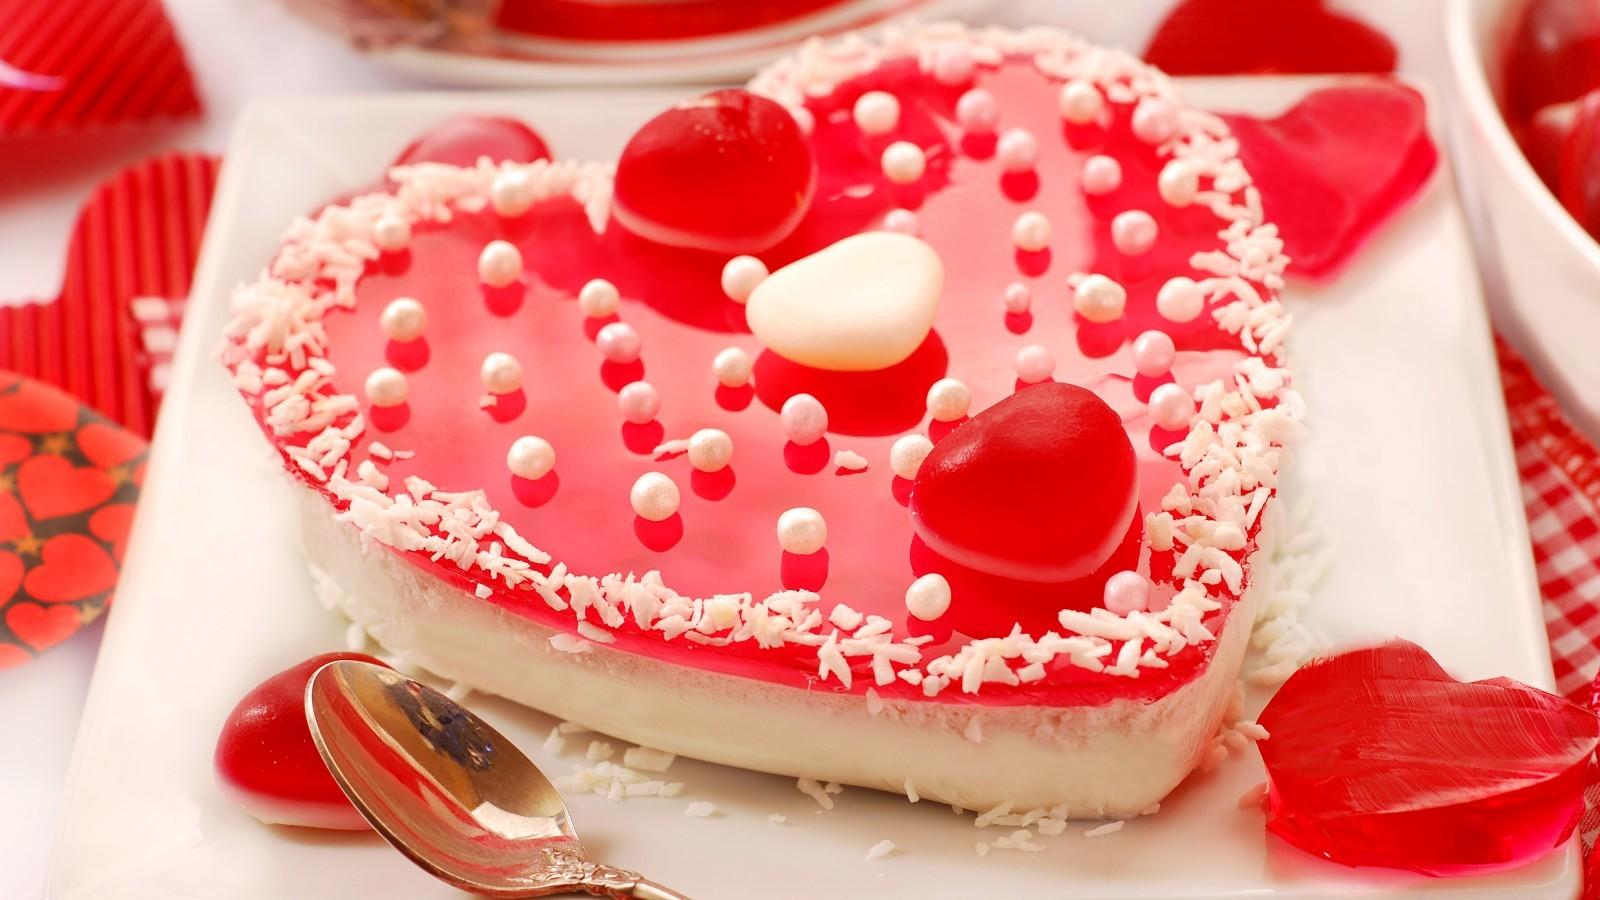 картинки десерт для любимой смартфон при